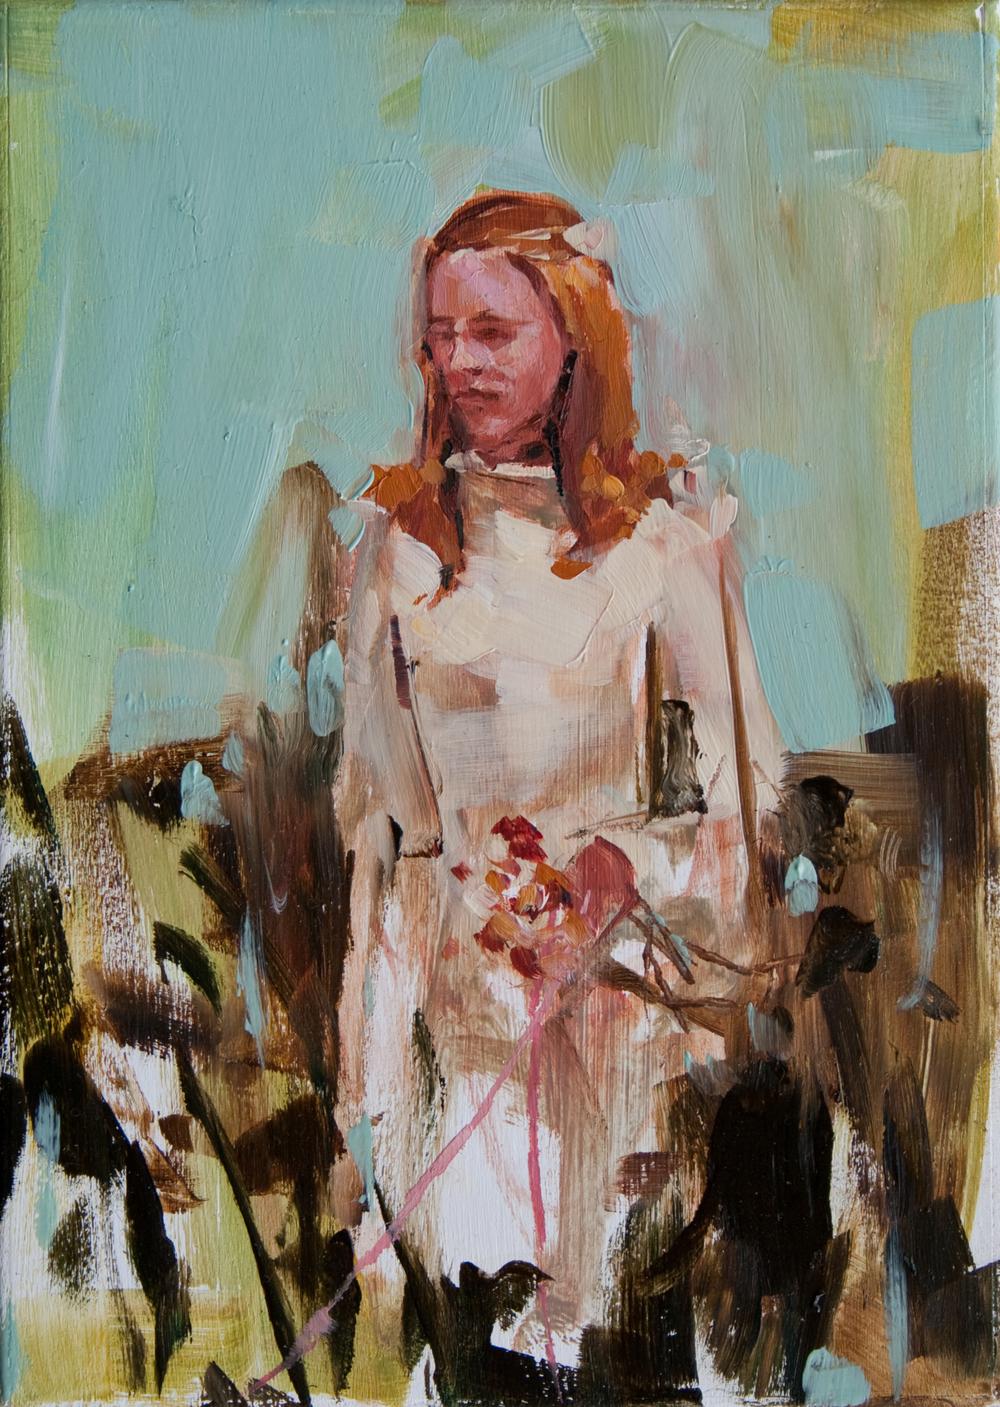 "Wedding Dress, oil on panel, 7"" x 5"", 2011"